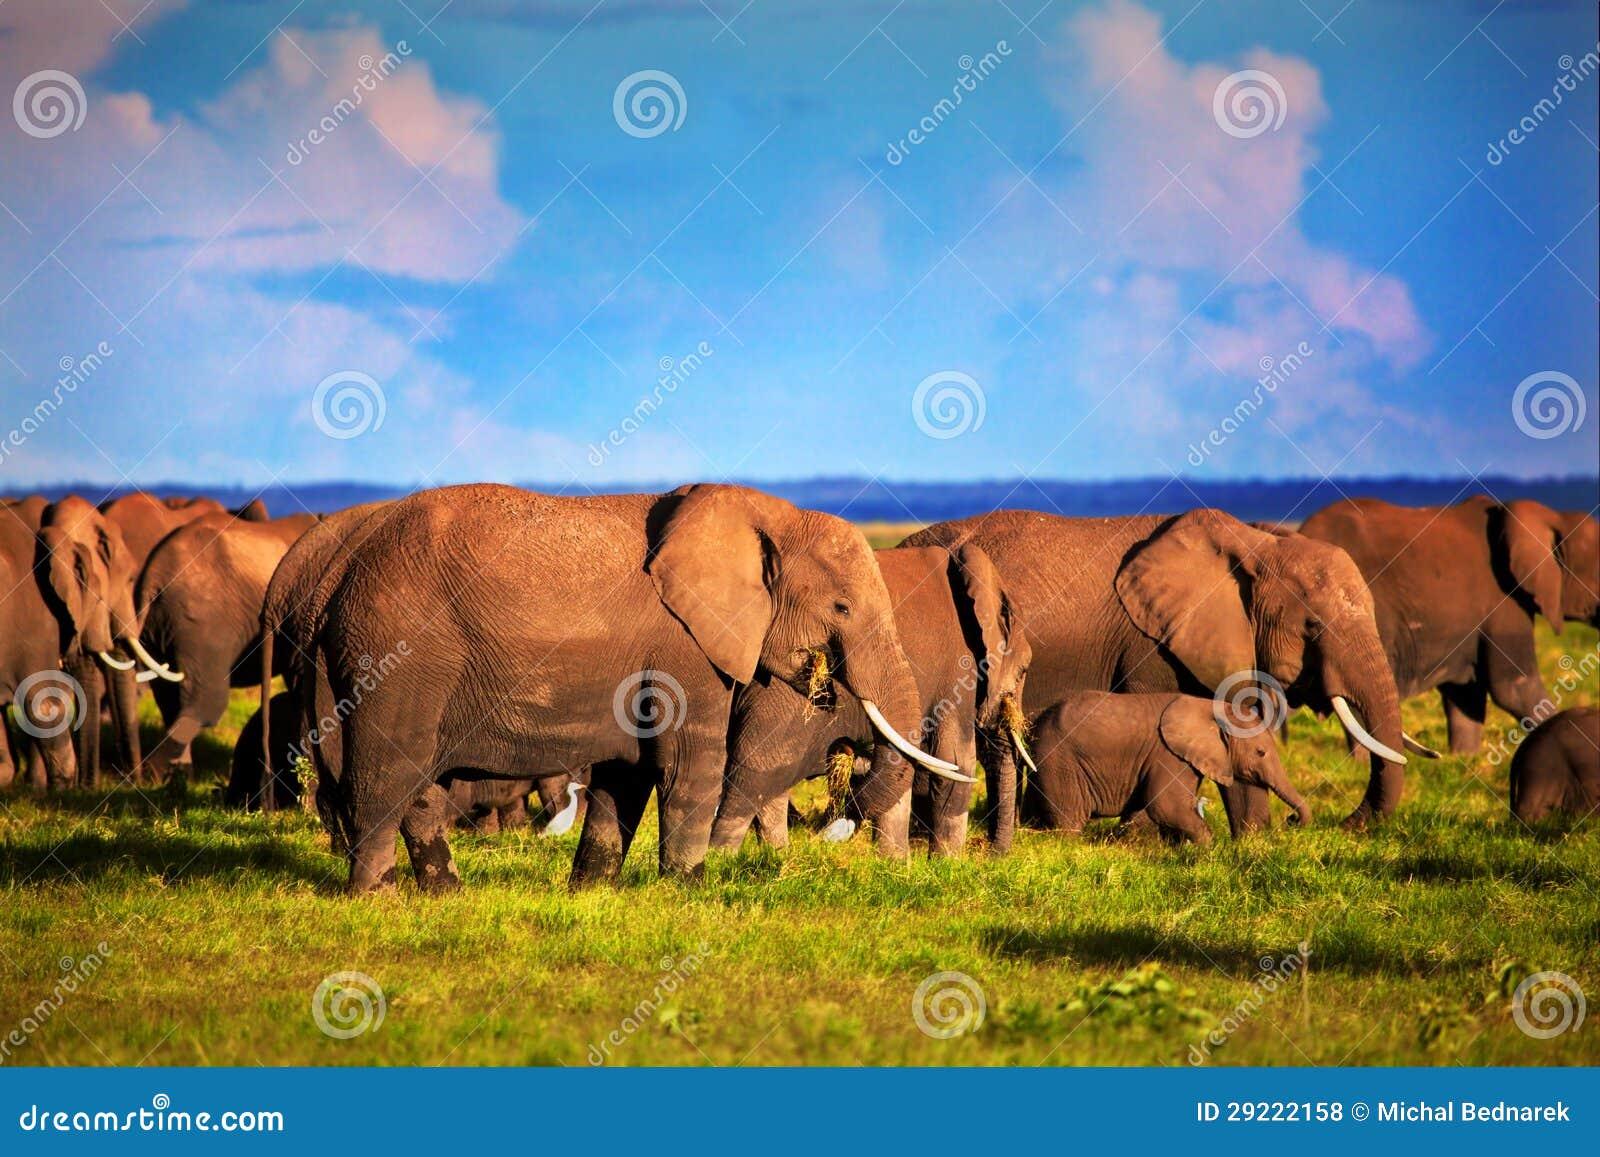 Gregge degli elefanti sulla savanna. Safari in Amboseli, Kenia, Africa